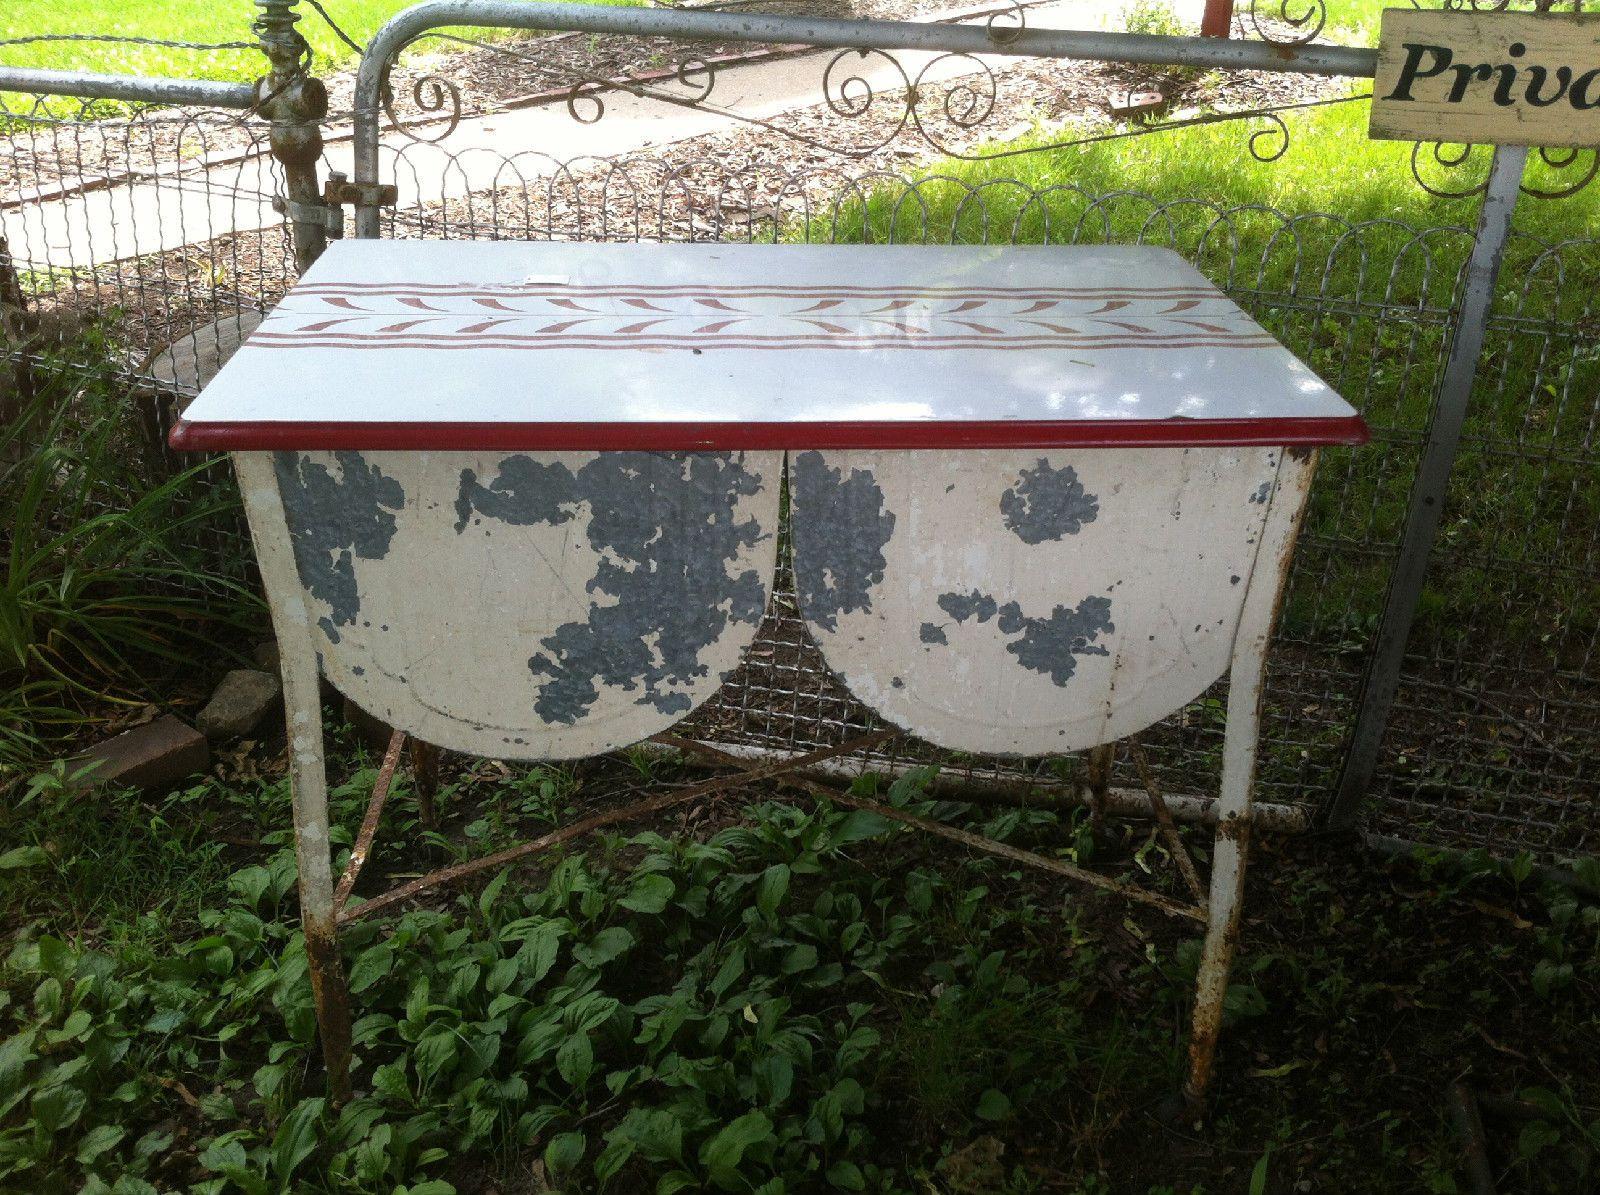 Laundry sink ebay - Vintage Celina Galvanized Double Wash Tub On Wheels With Porcelain Lid Nice